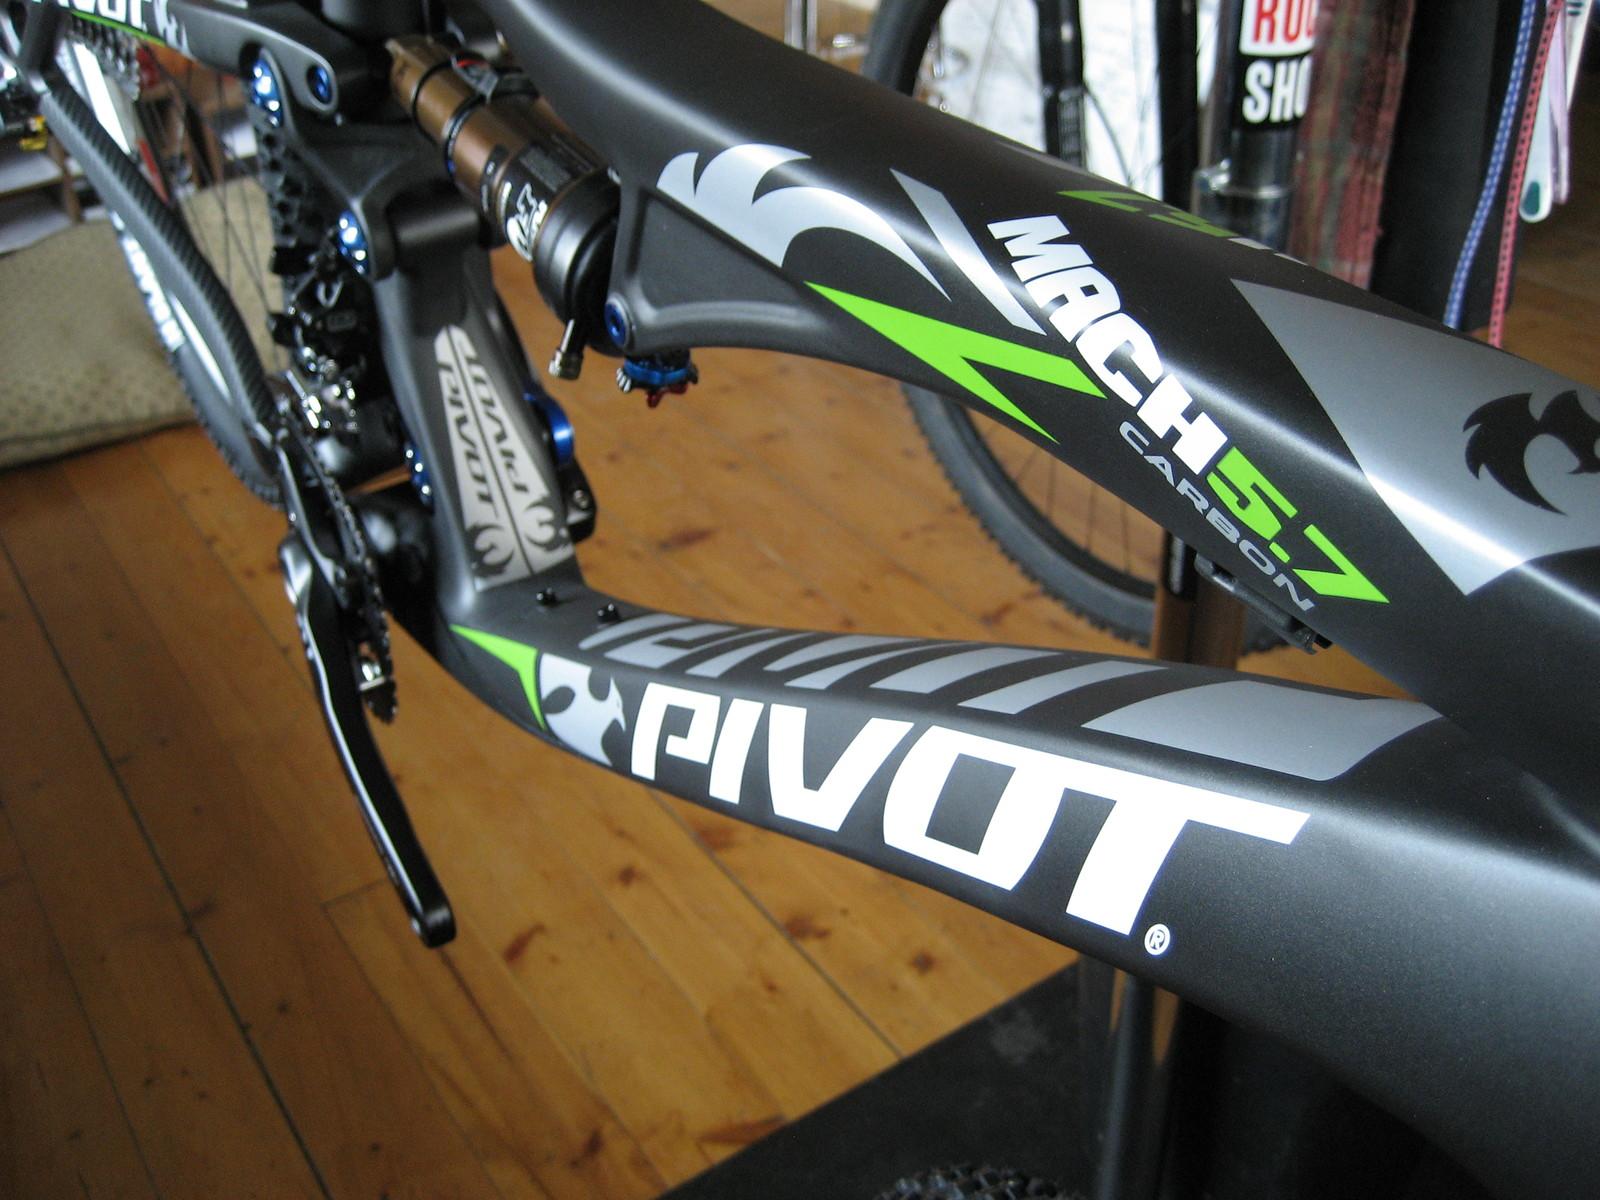 Ian's Pivot Mach 5.7 Carbon